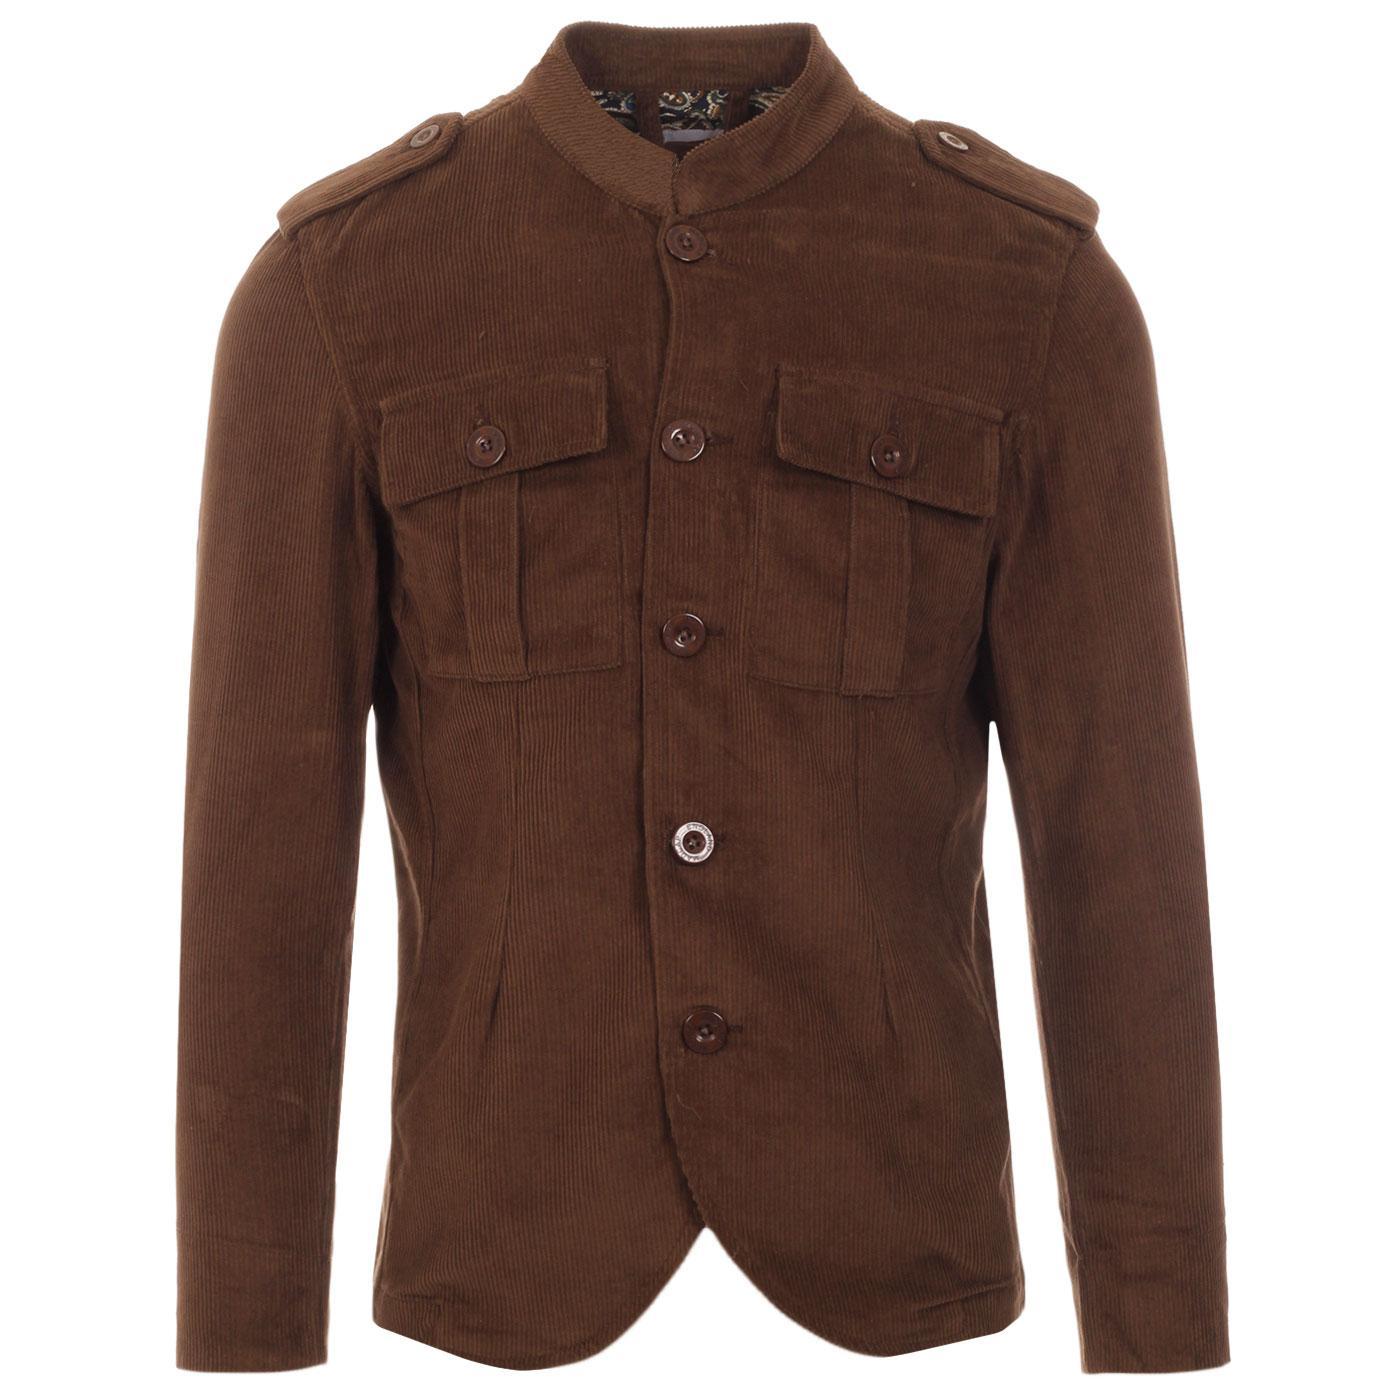 Pepper MADCAP ENGLAND Mod Cord Tunic Jacket COCOA